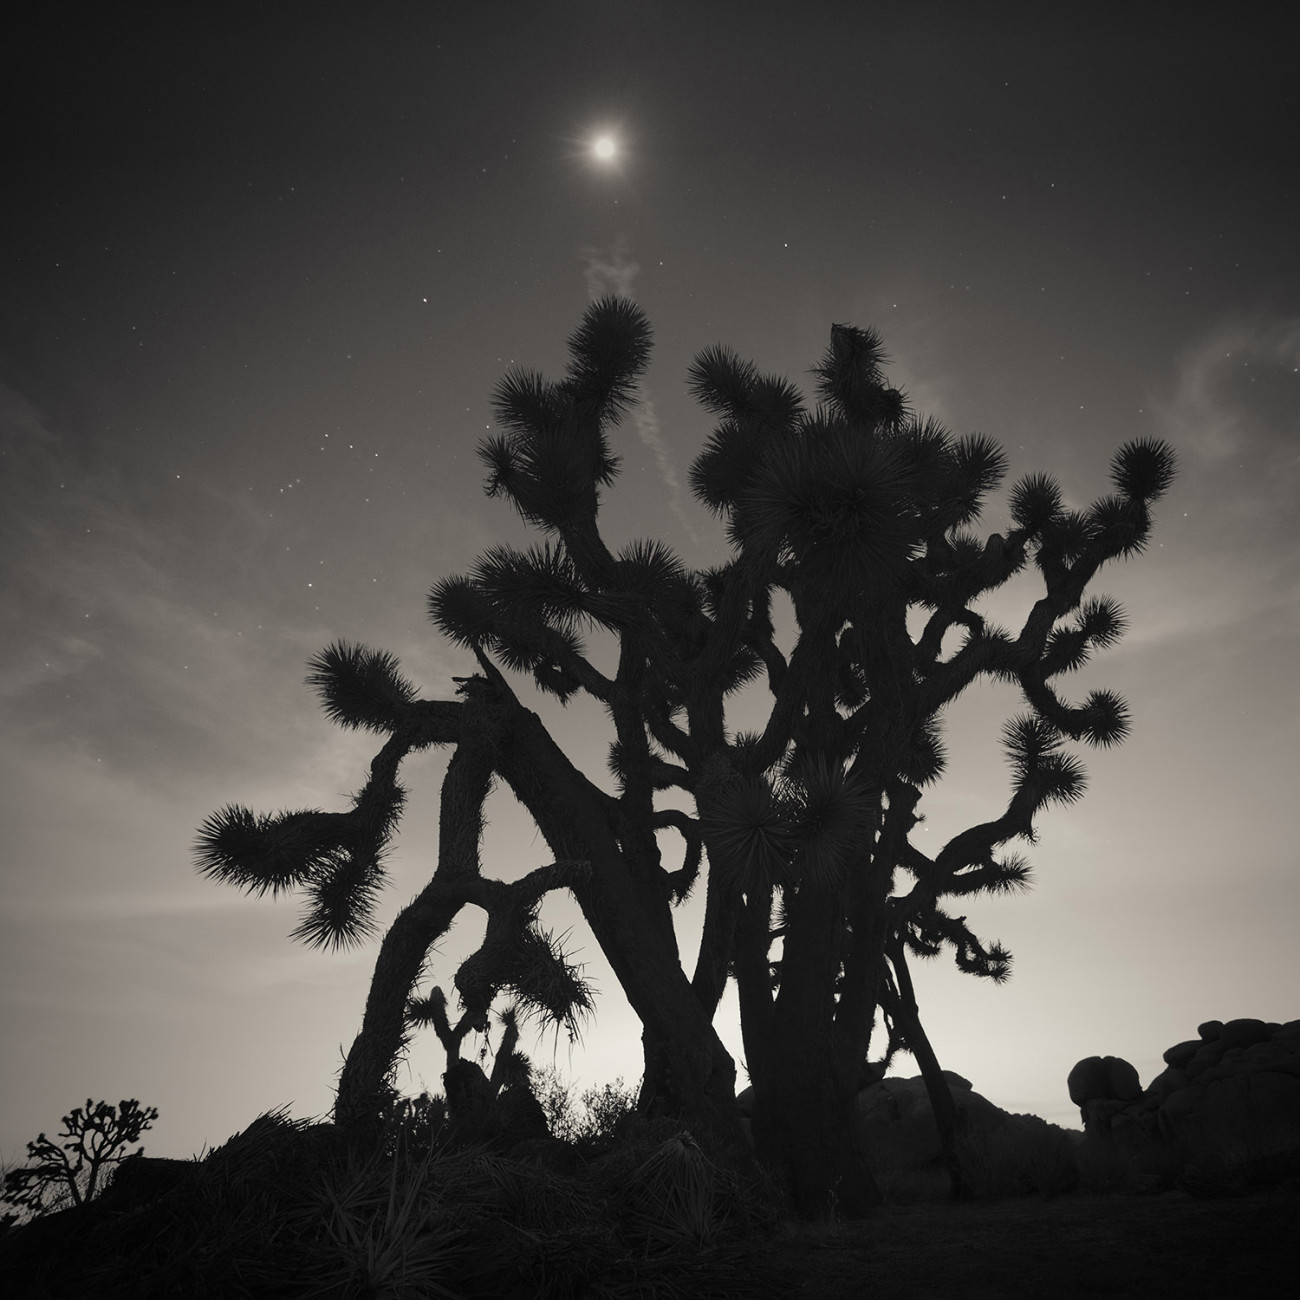 Orion and Joshua Tree, CA, 2012